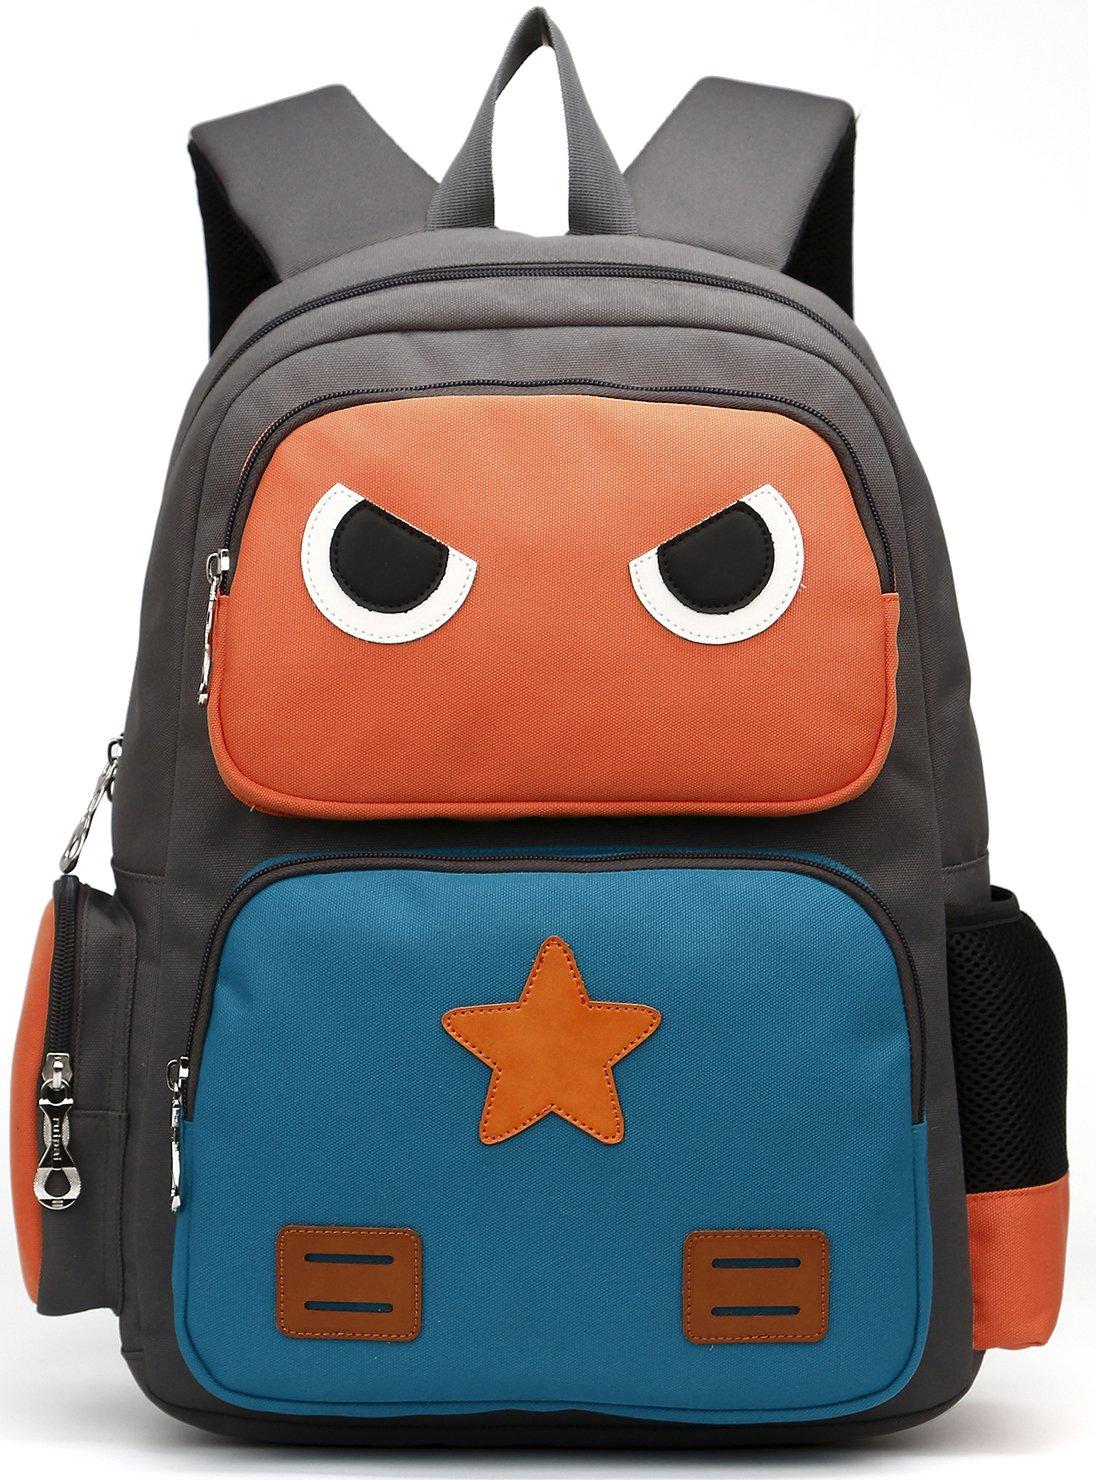 ArcEnCiel Kid's Backpack (Orange and Green) by ArcEnCiel